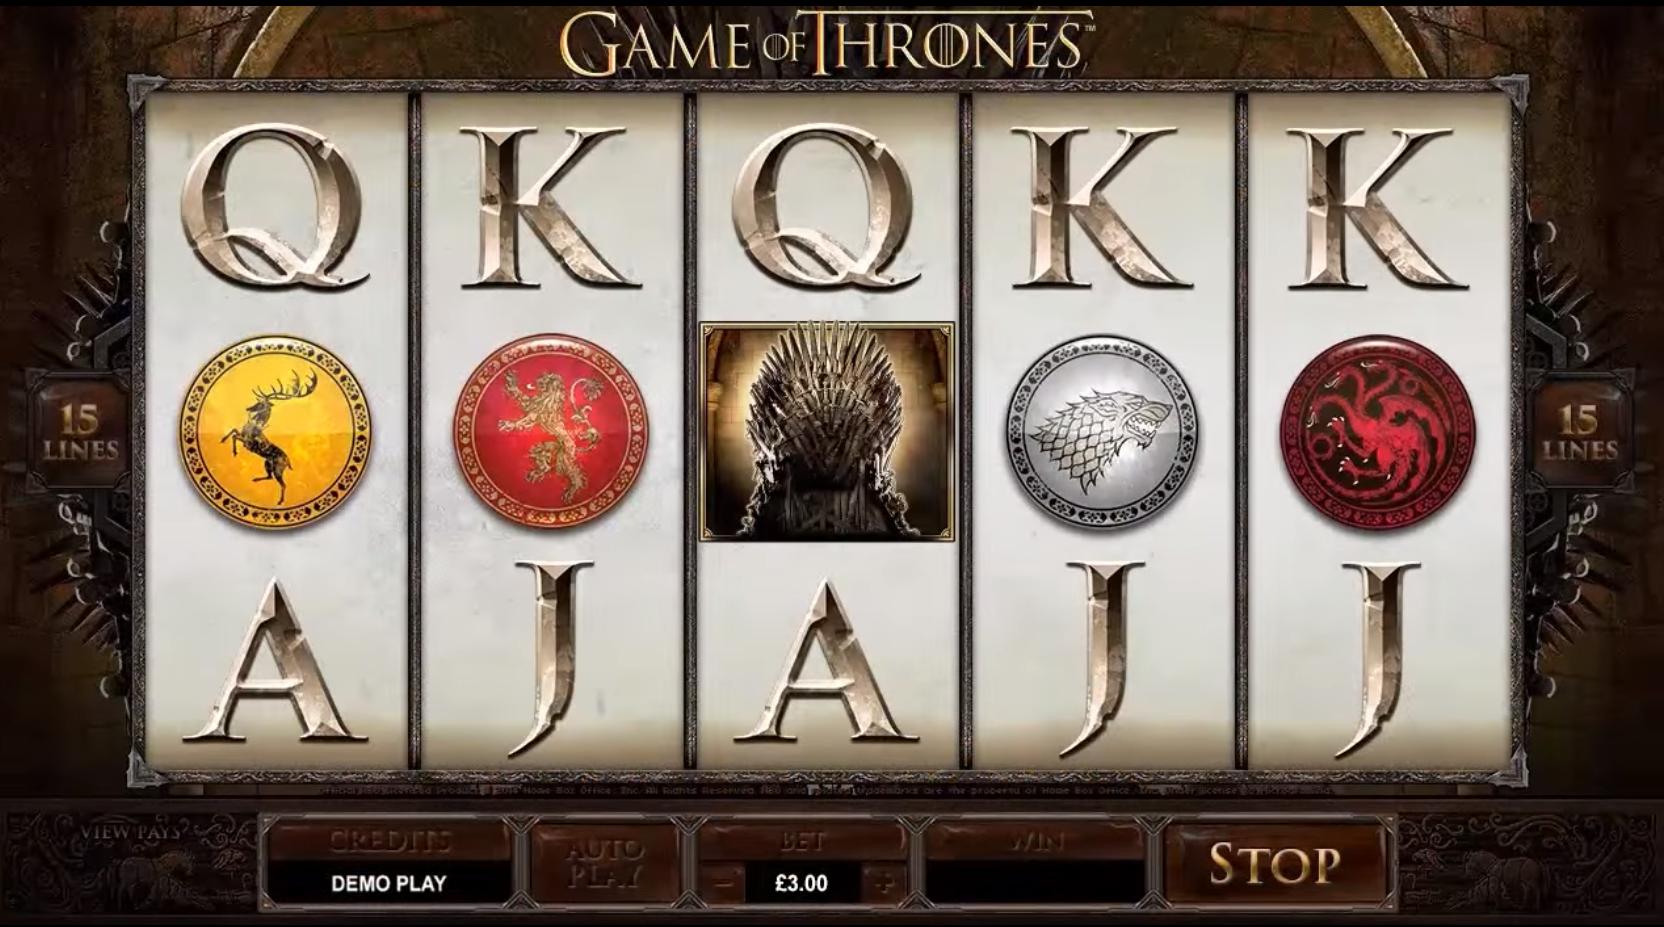 Game of thrones slot machine 2019